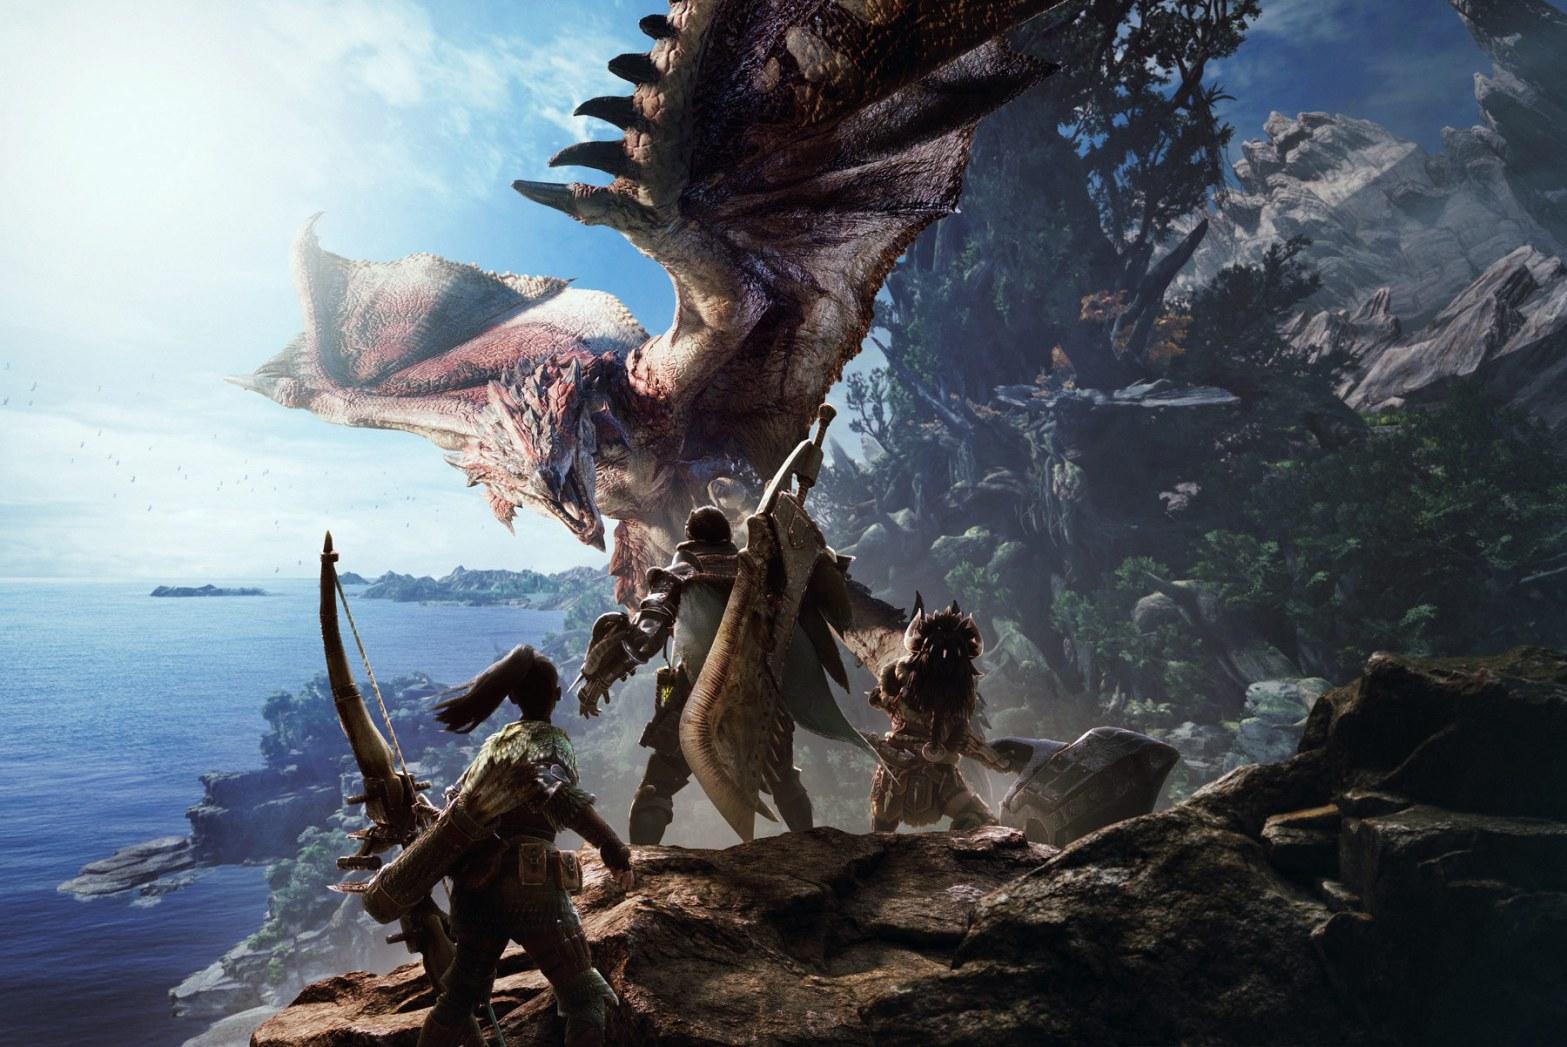 Monster Hunter World, Games, Online Games, Video Games